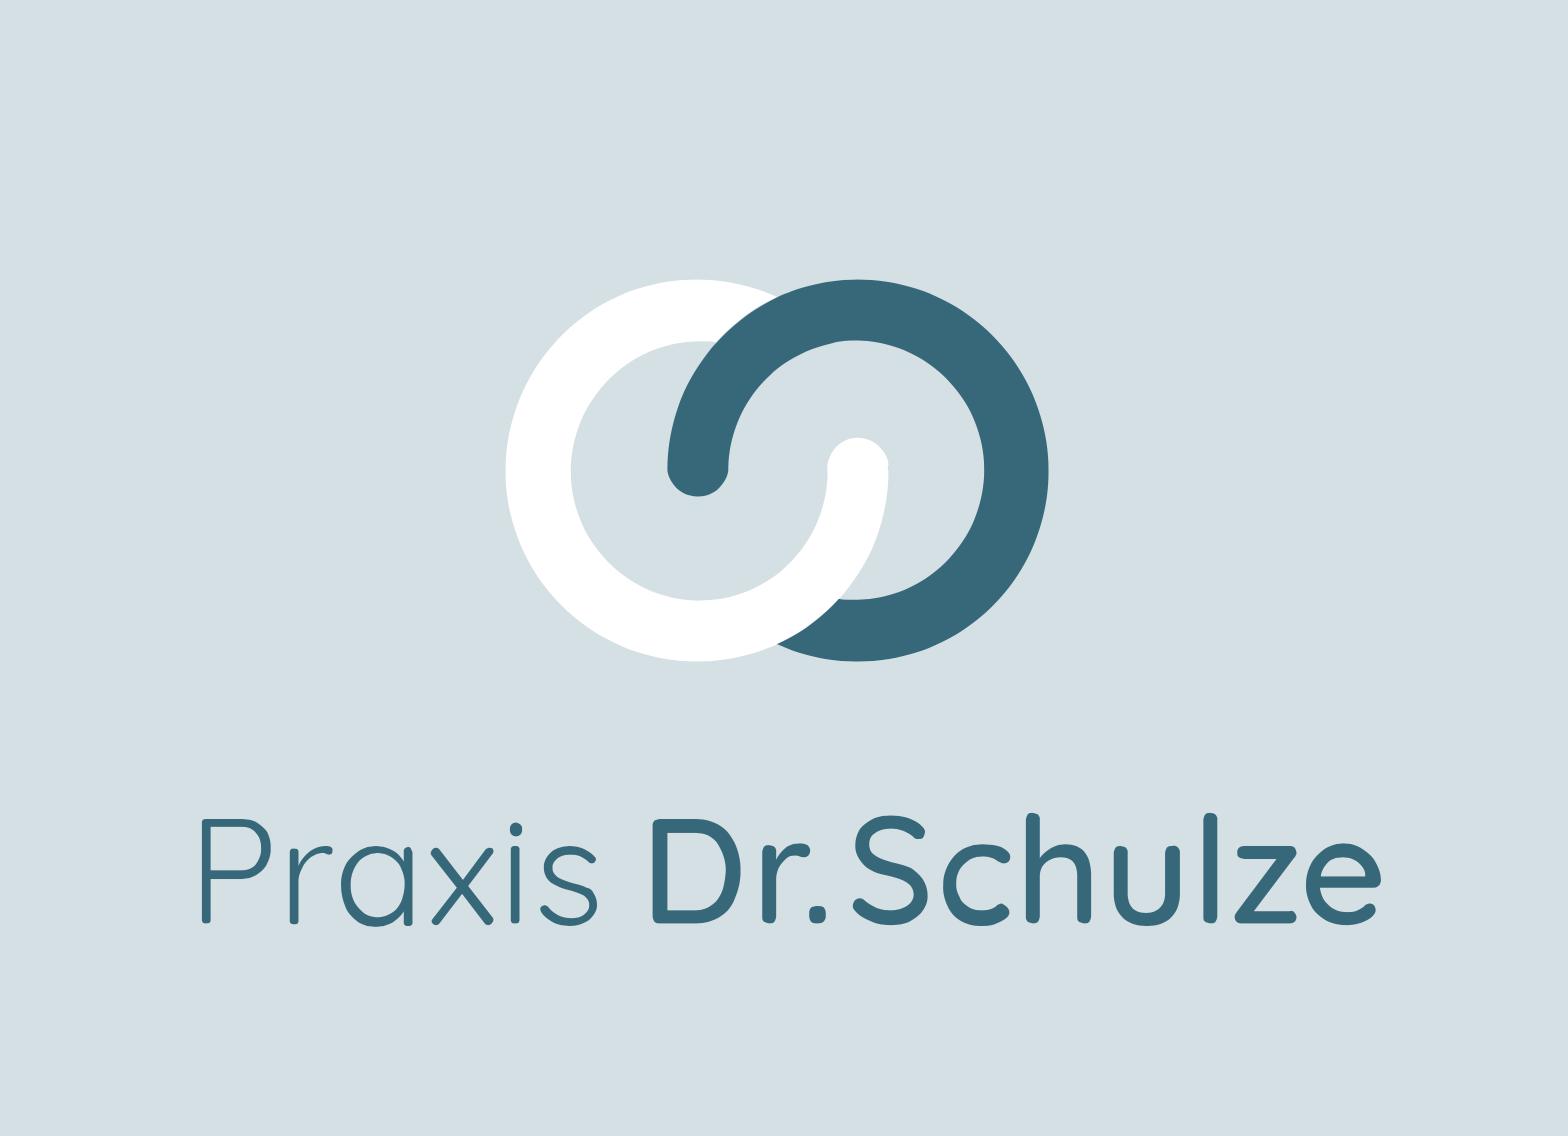 Praxis Dr. Schulze